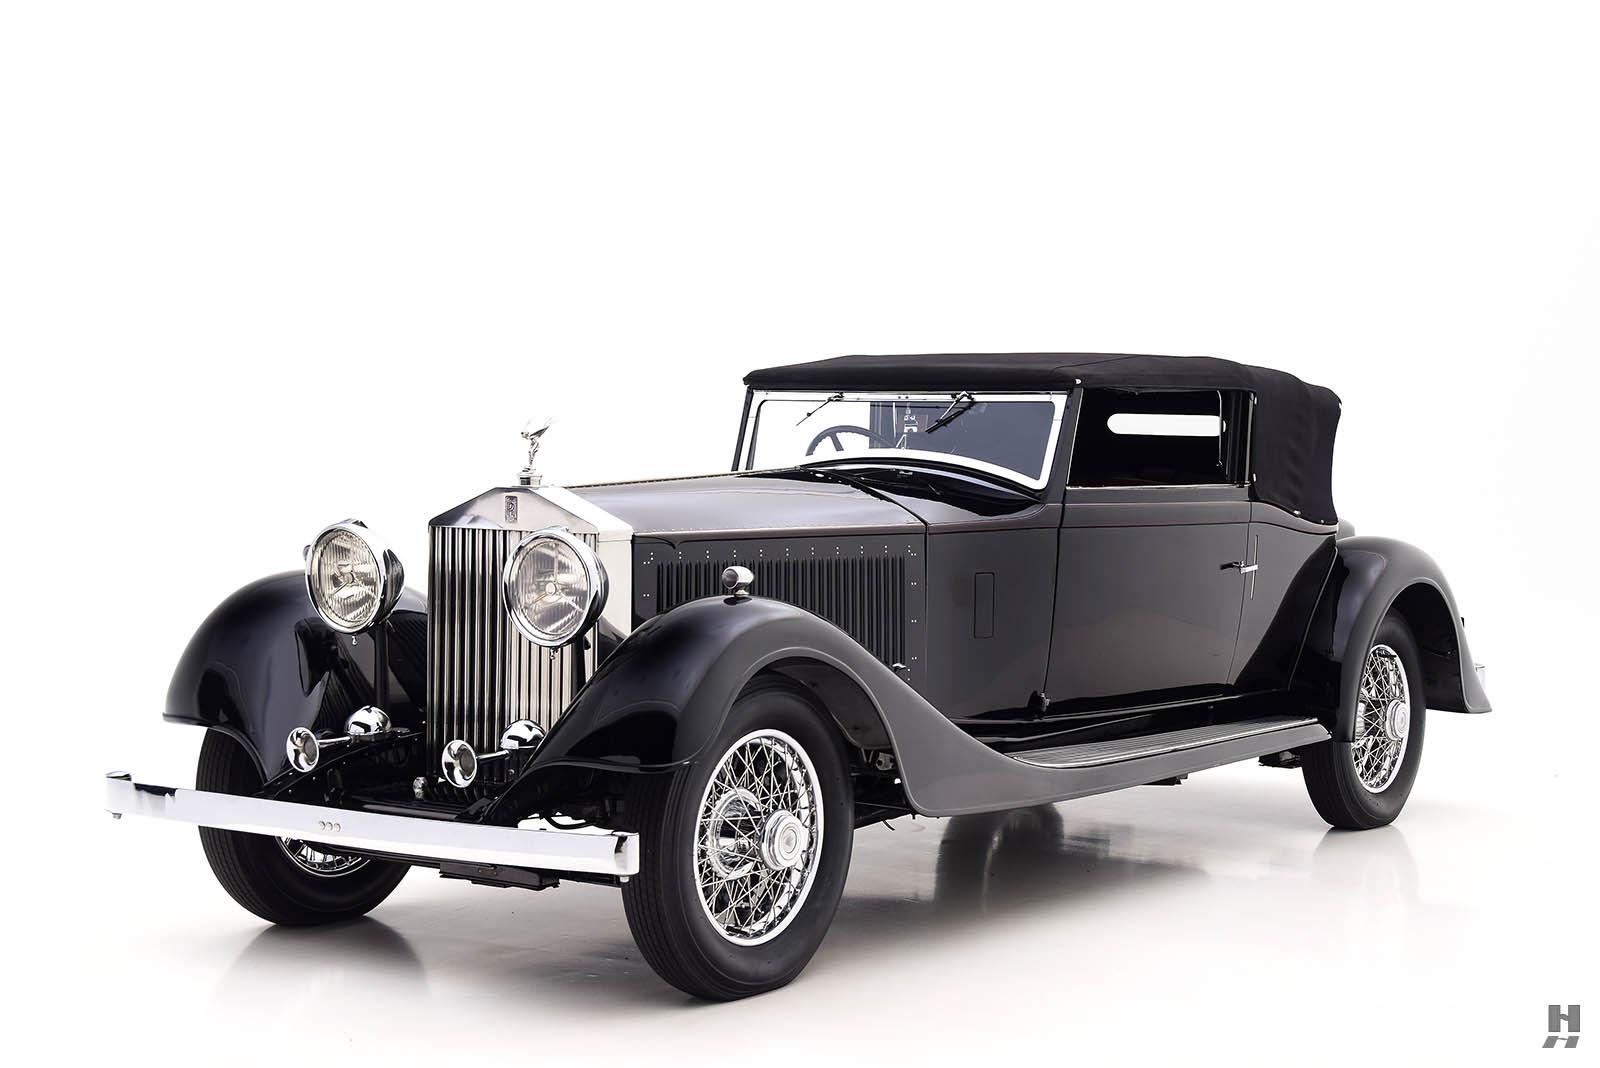 1934 Rolls-Royce Phantom II Drophead For Sale | Buy Classic Cars ...